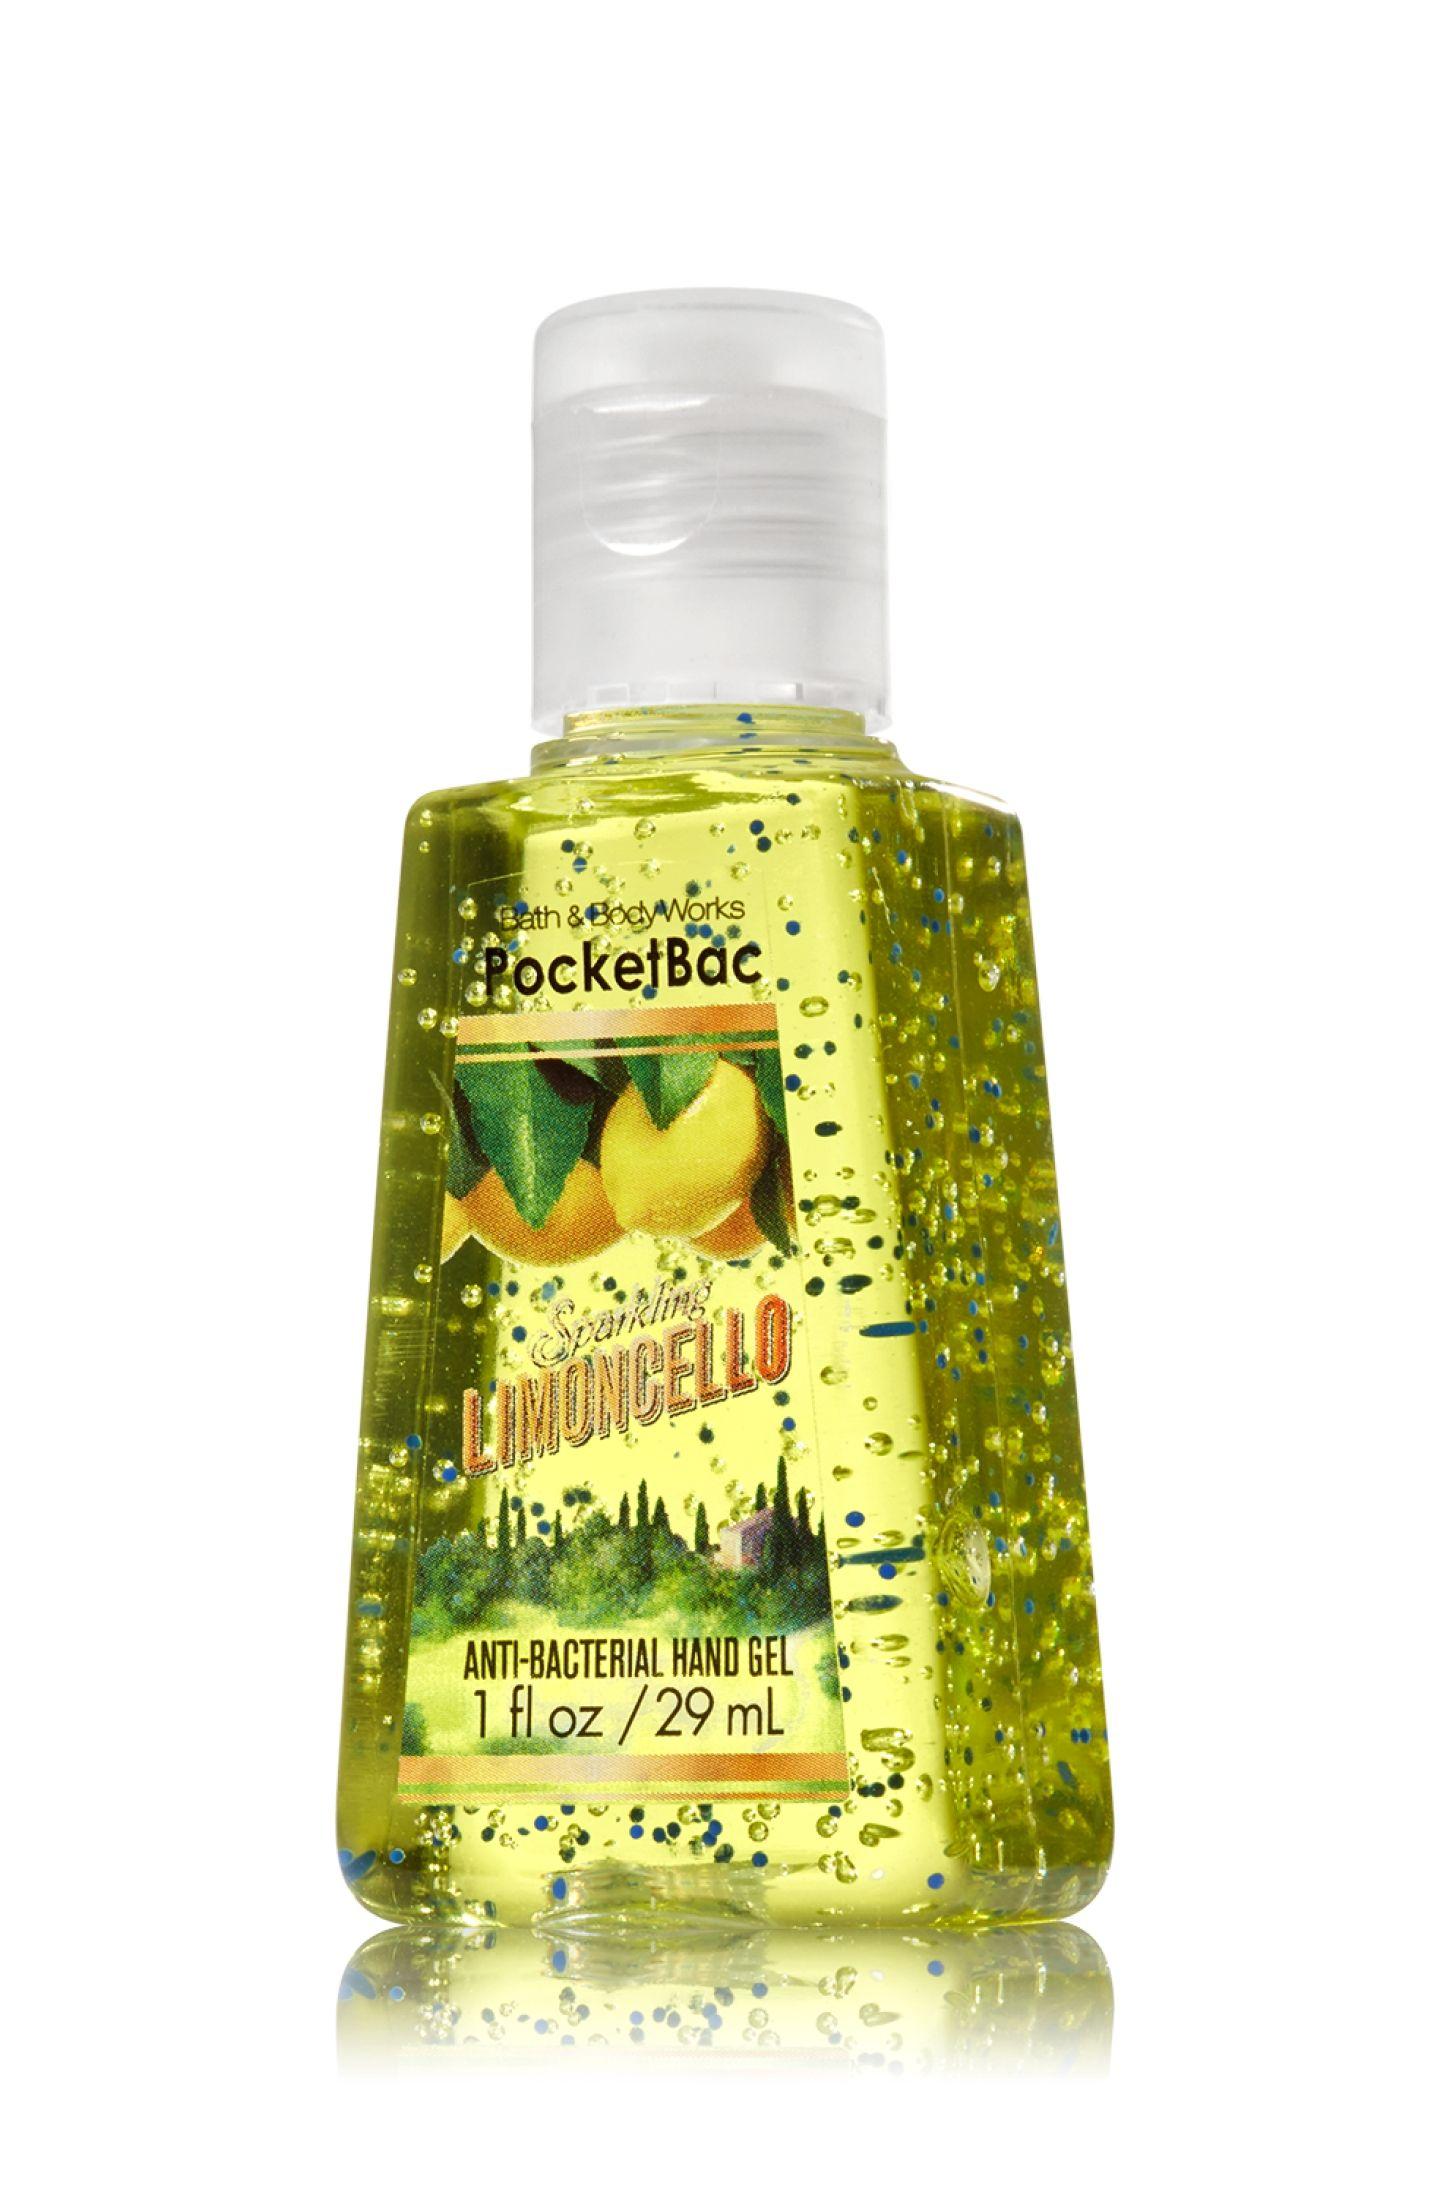 Limoncello Bath Body Works Pocketbac Sanitizing Hand Gel An